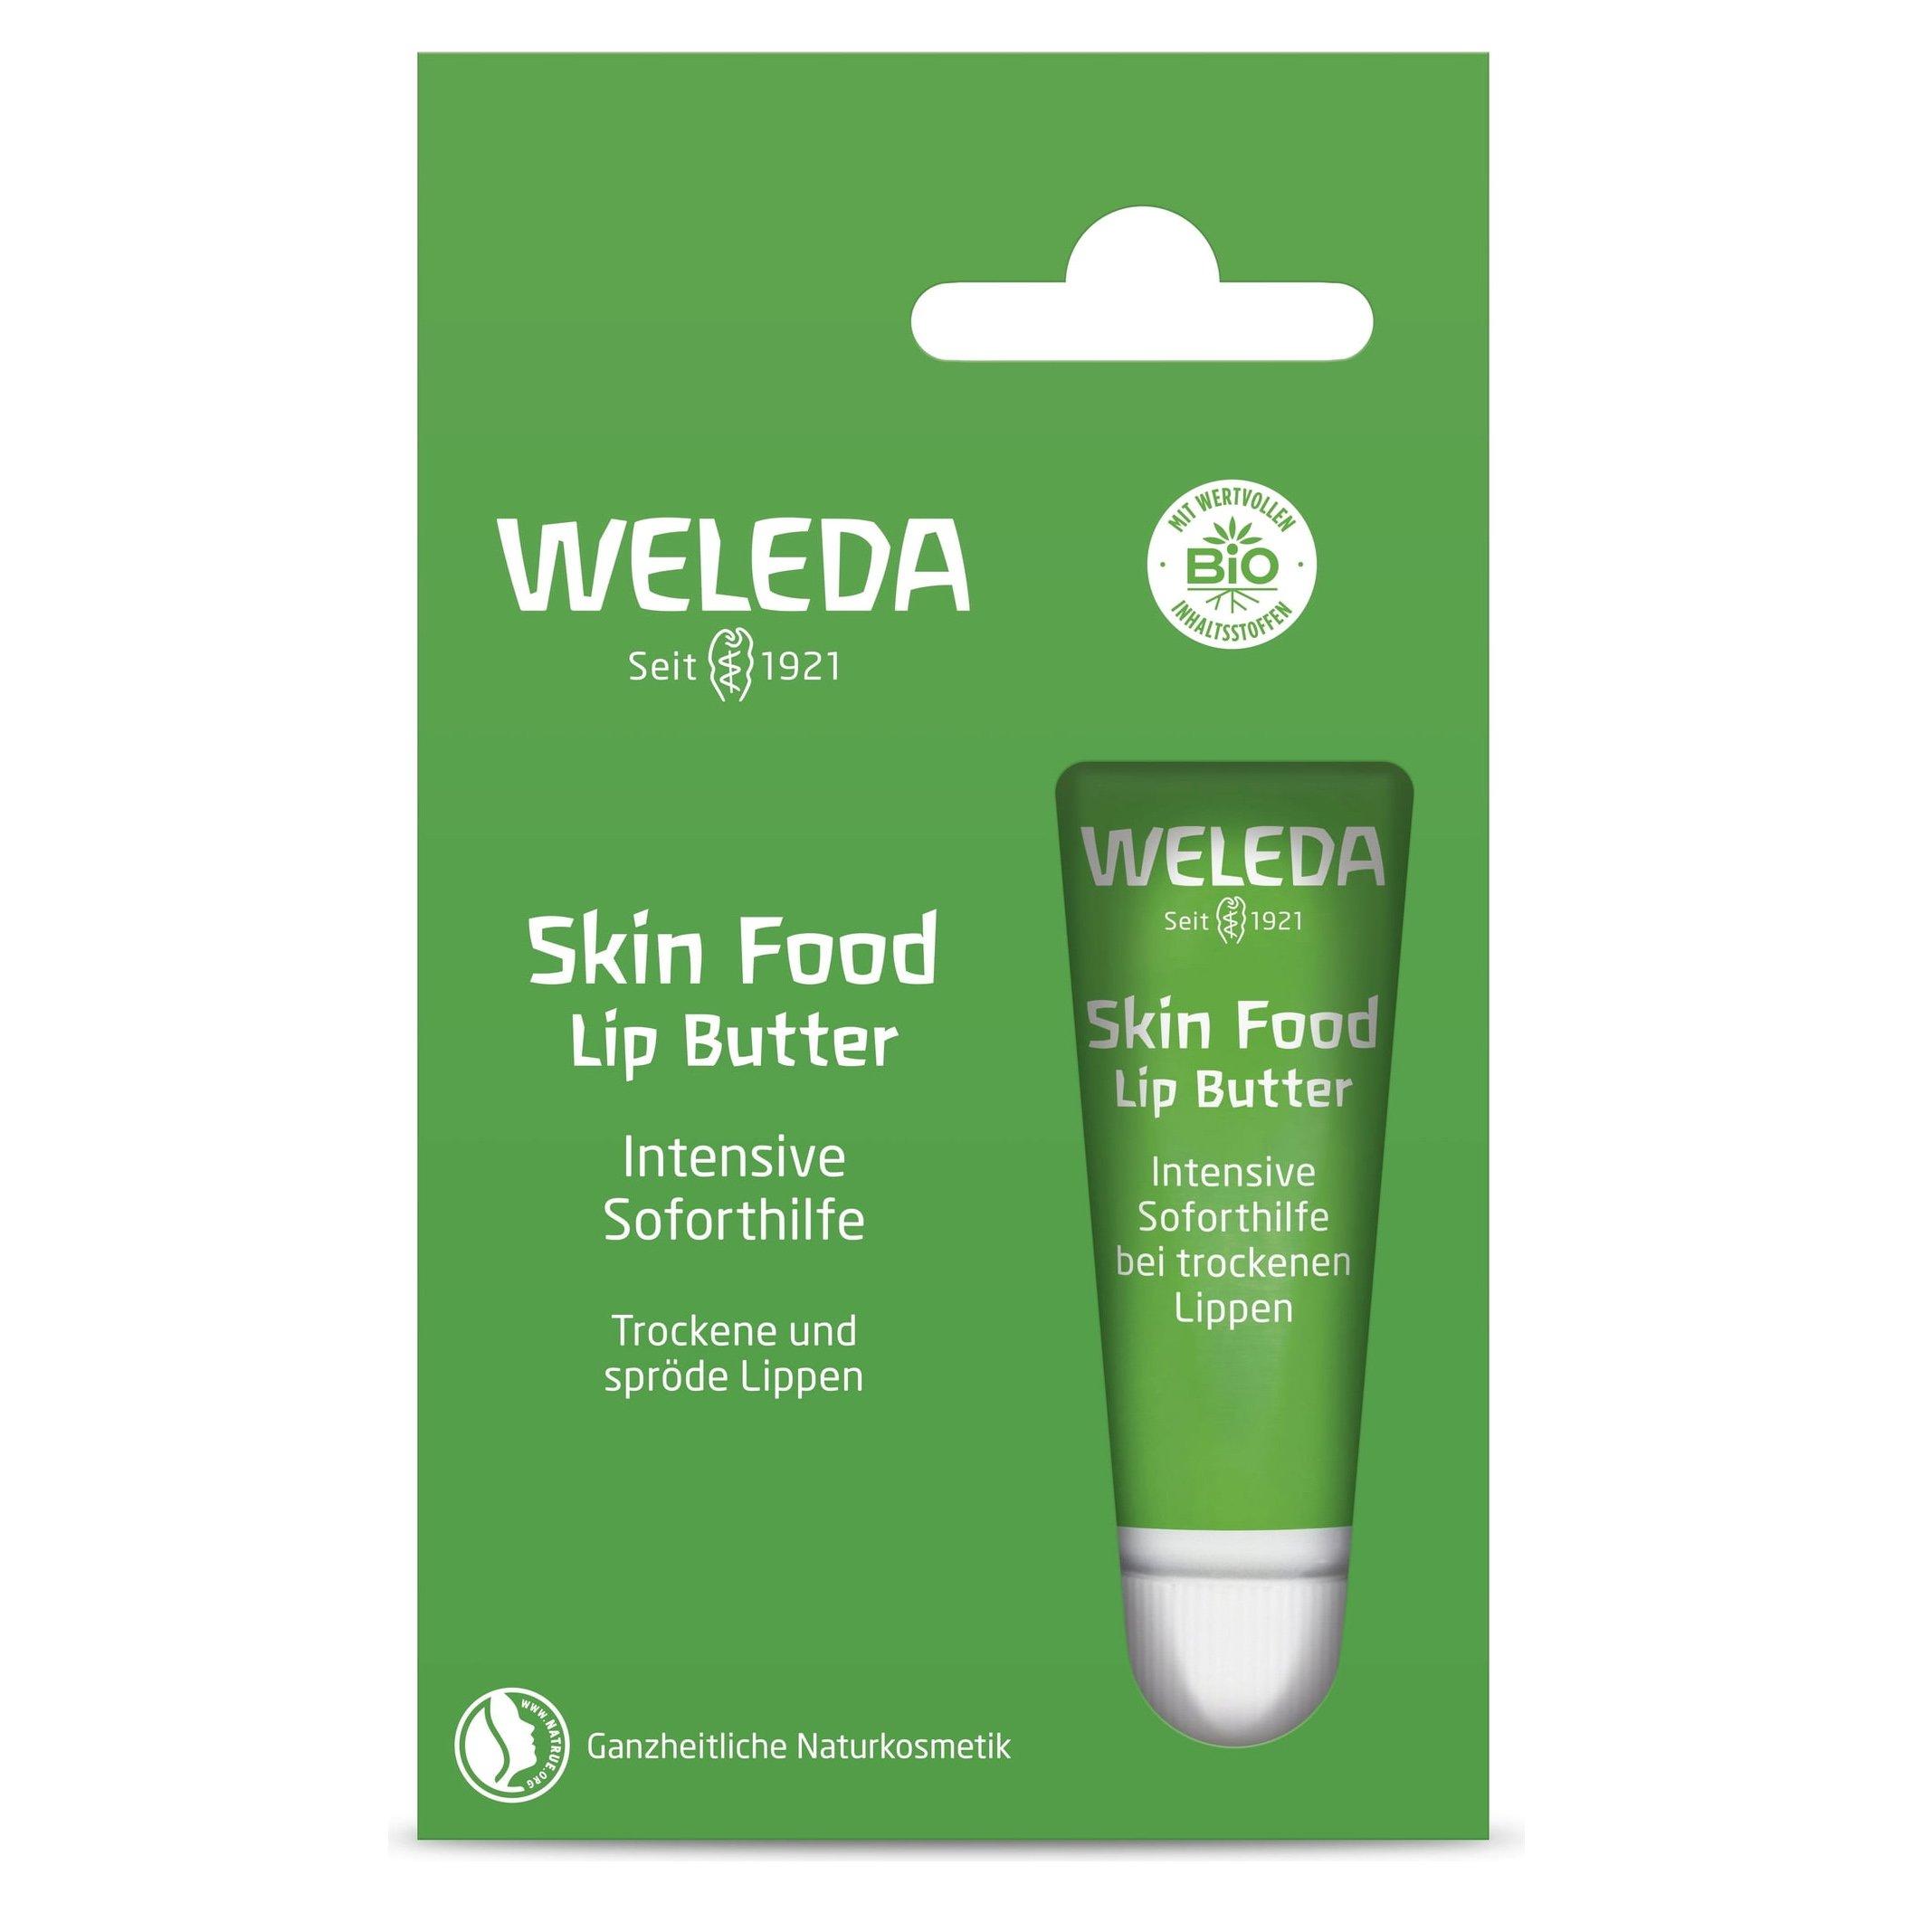 Weleda Skin Food Lip Butter Ενυδατικό Βούτυρο Χειλιών για Ξηρά & Σκασμένα Χείλη 8ml